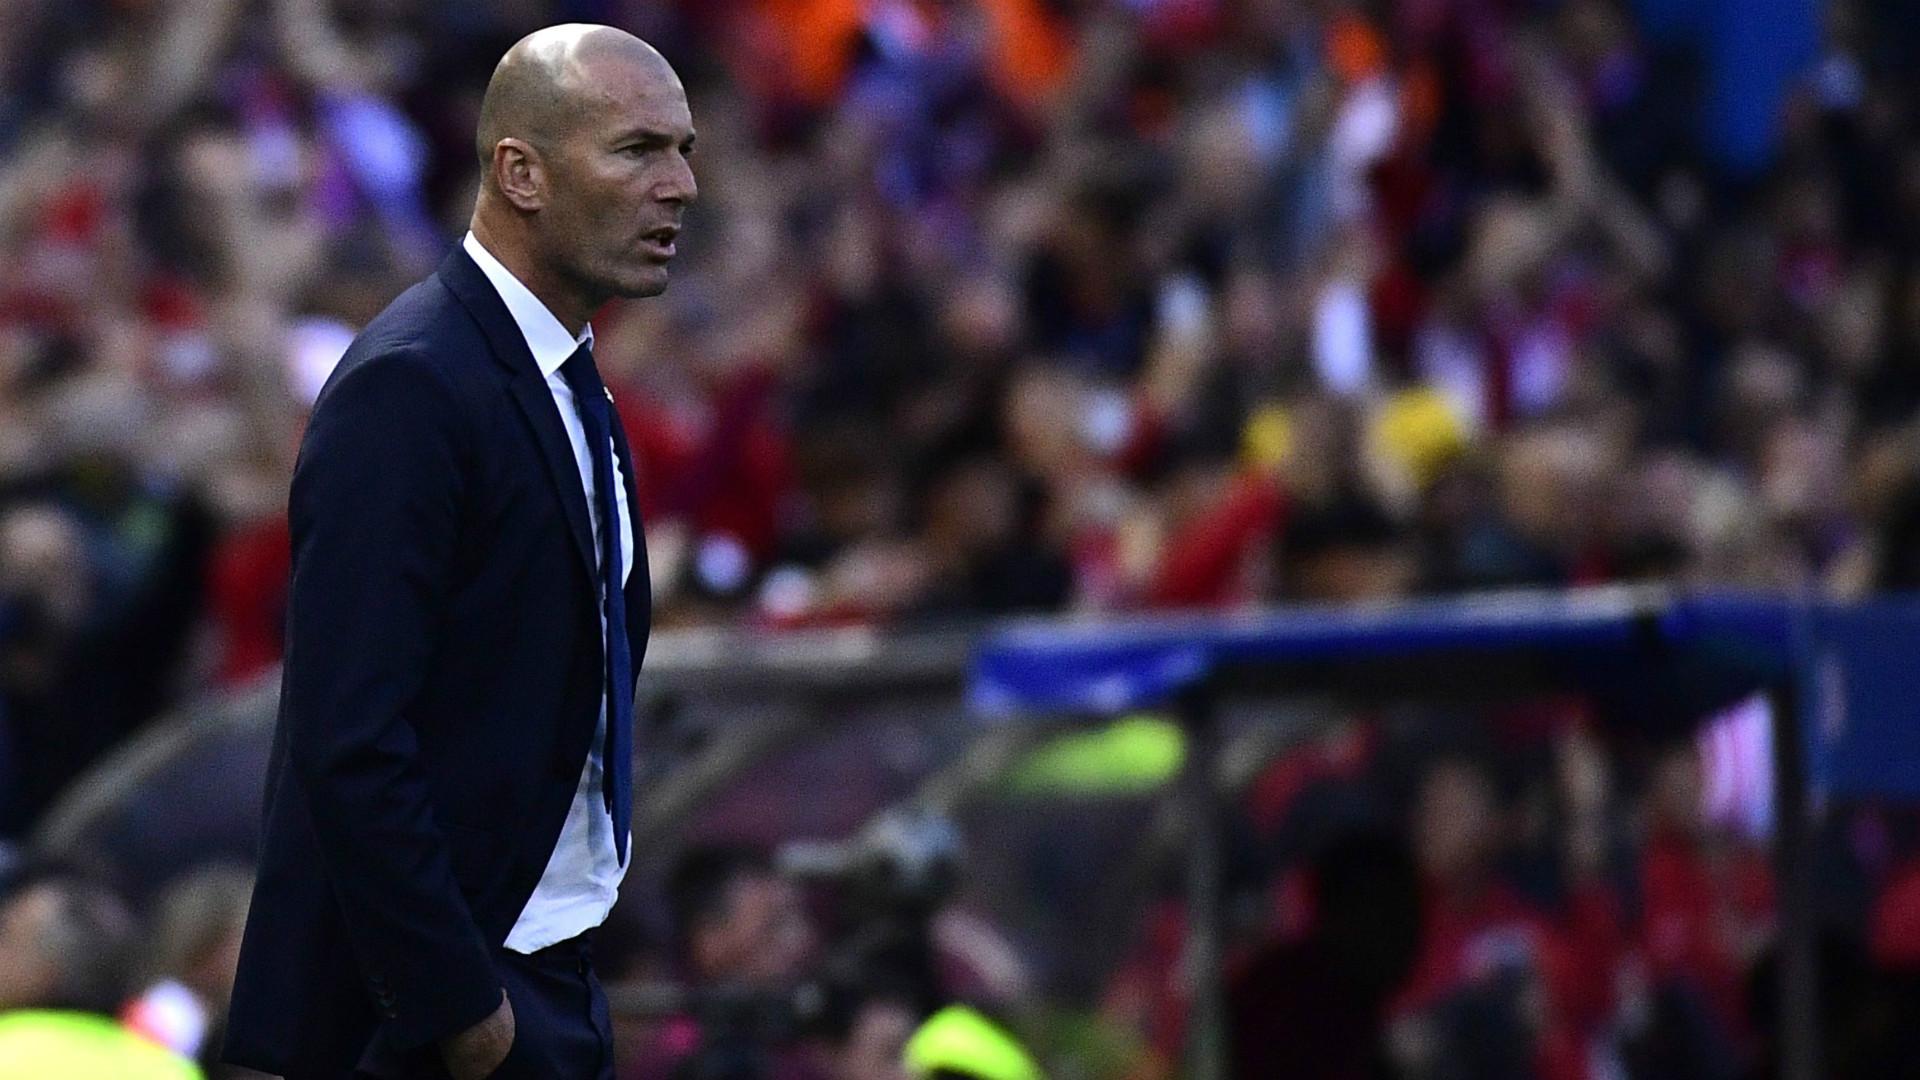 Zinedine Zidane Atletico Madrid Real Madrid UEFA Champions League